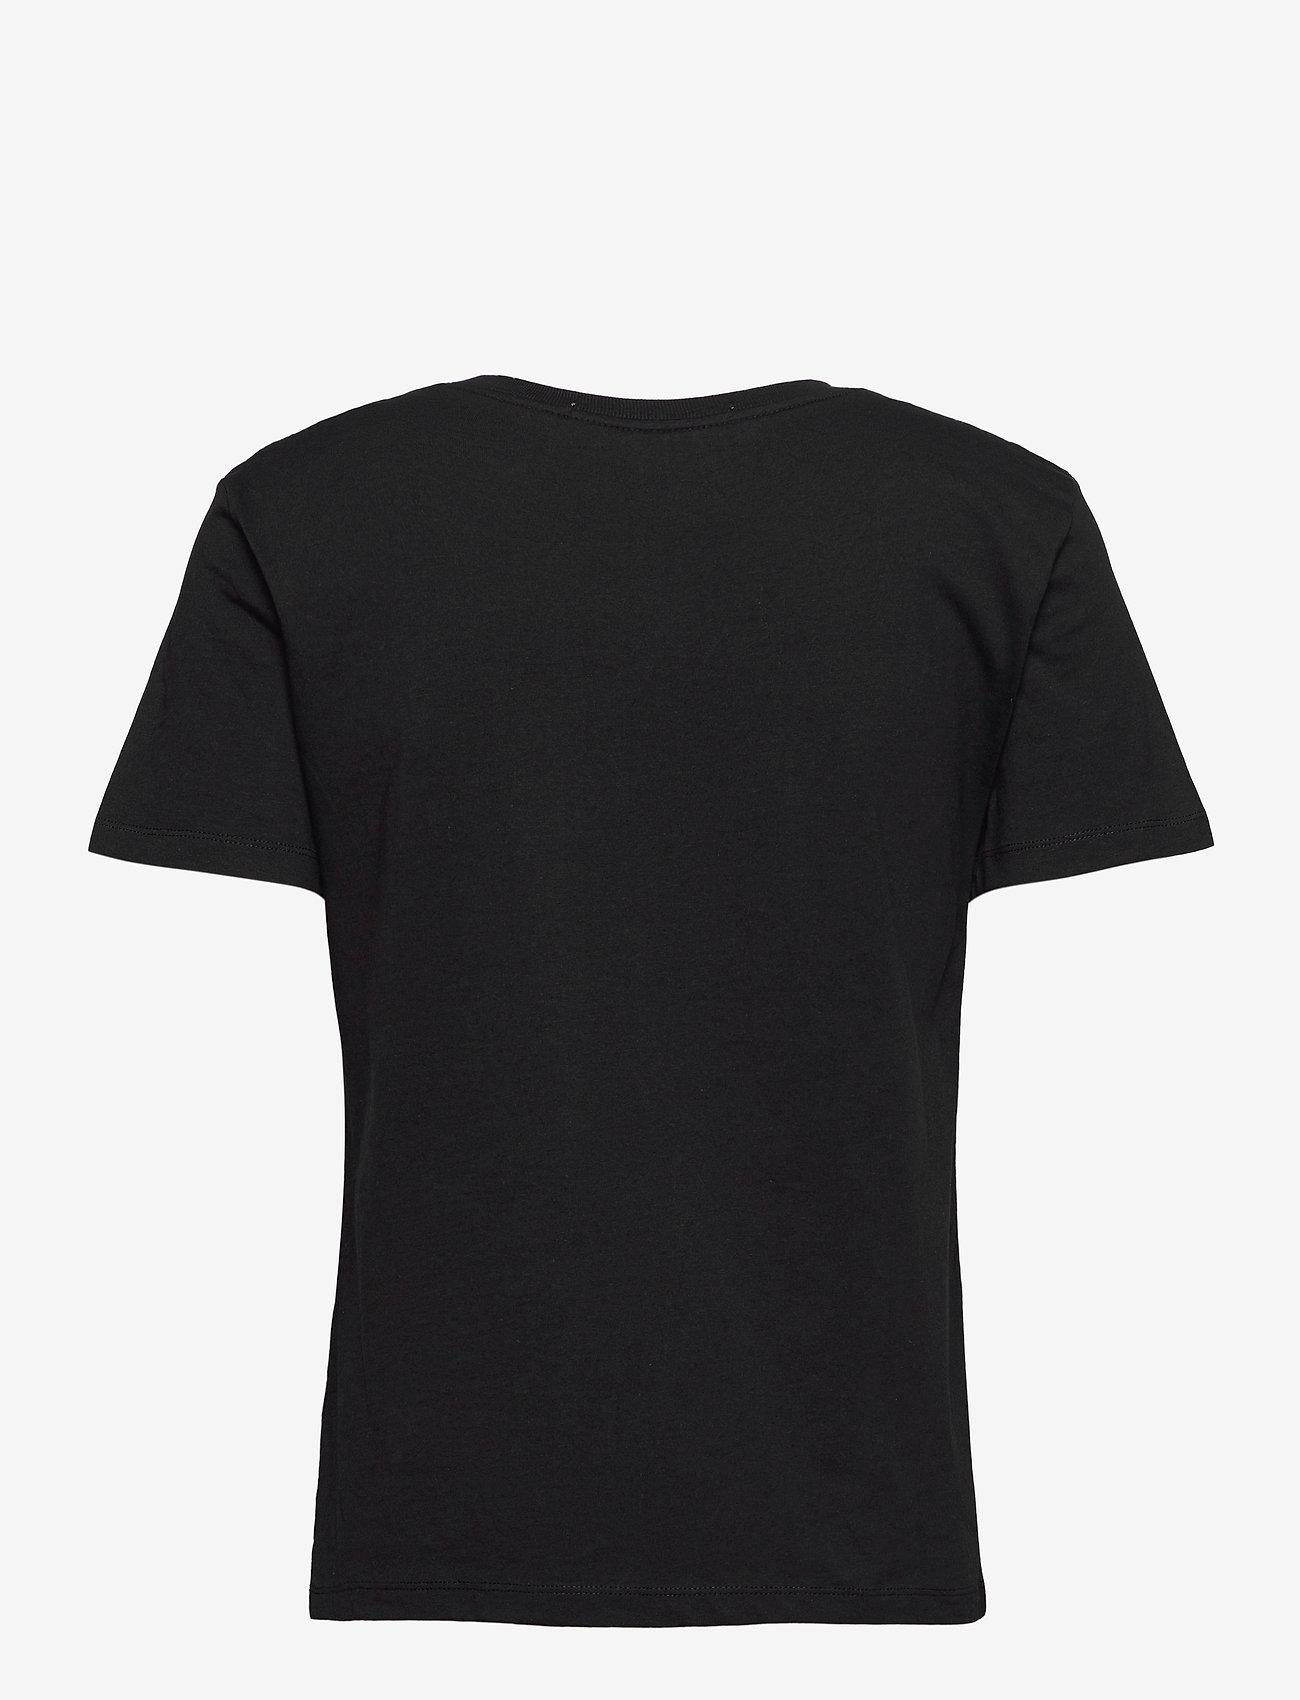 Calvin Klein Jeans - REFLECTIVE MONOGRAM TEE - t-shirts - ck black - 1